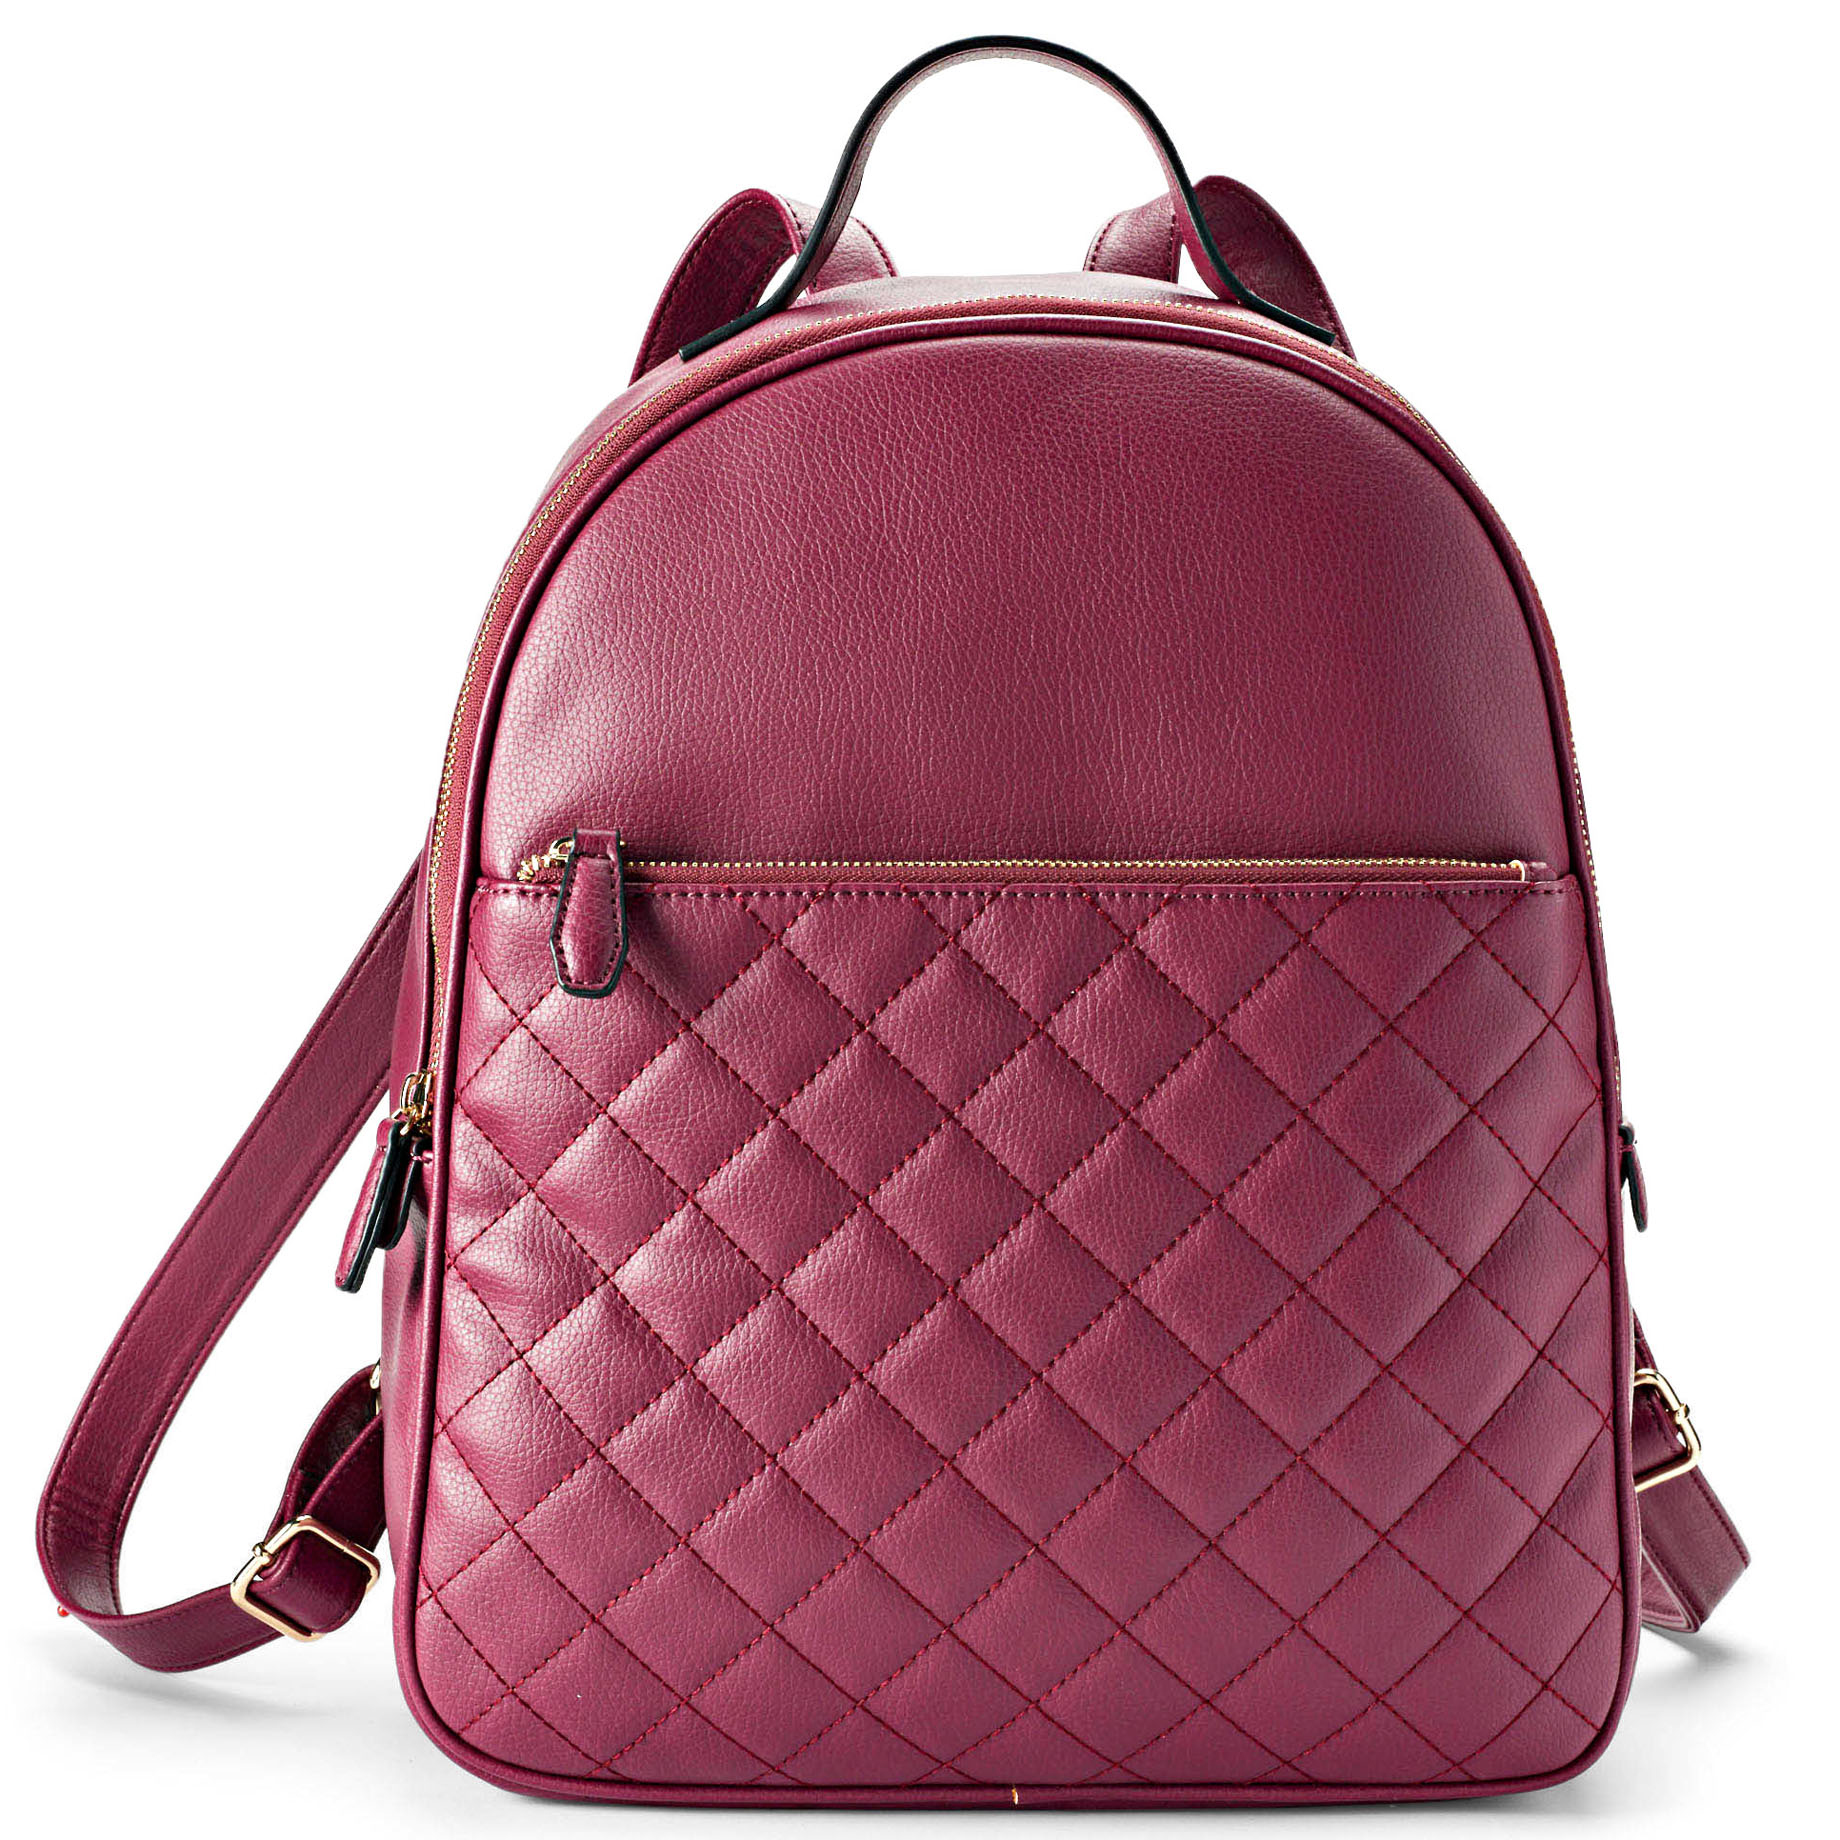 apt 9 backpack